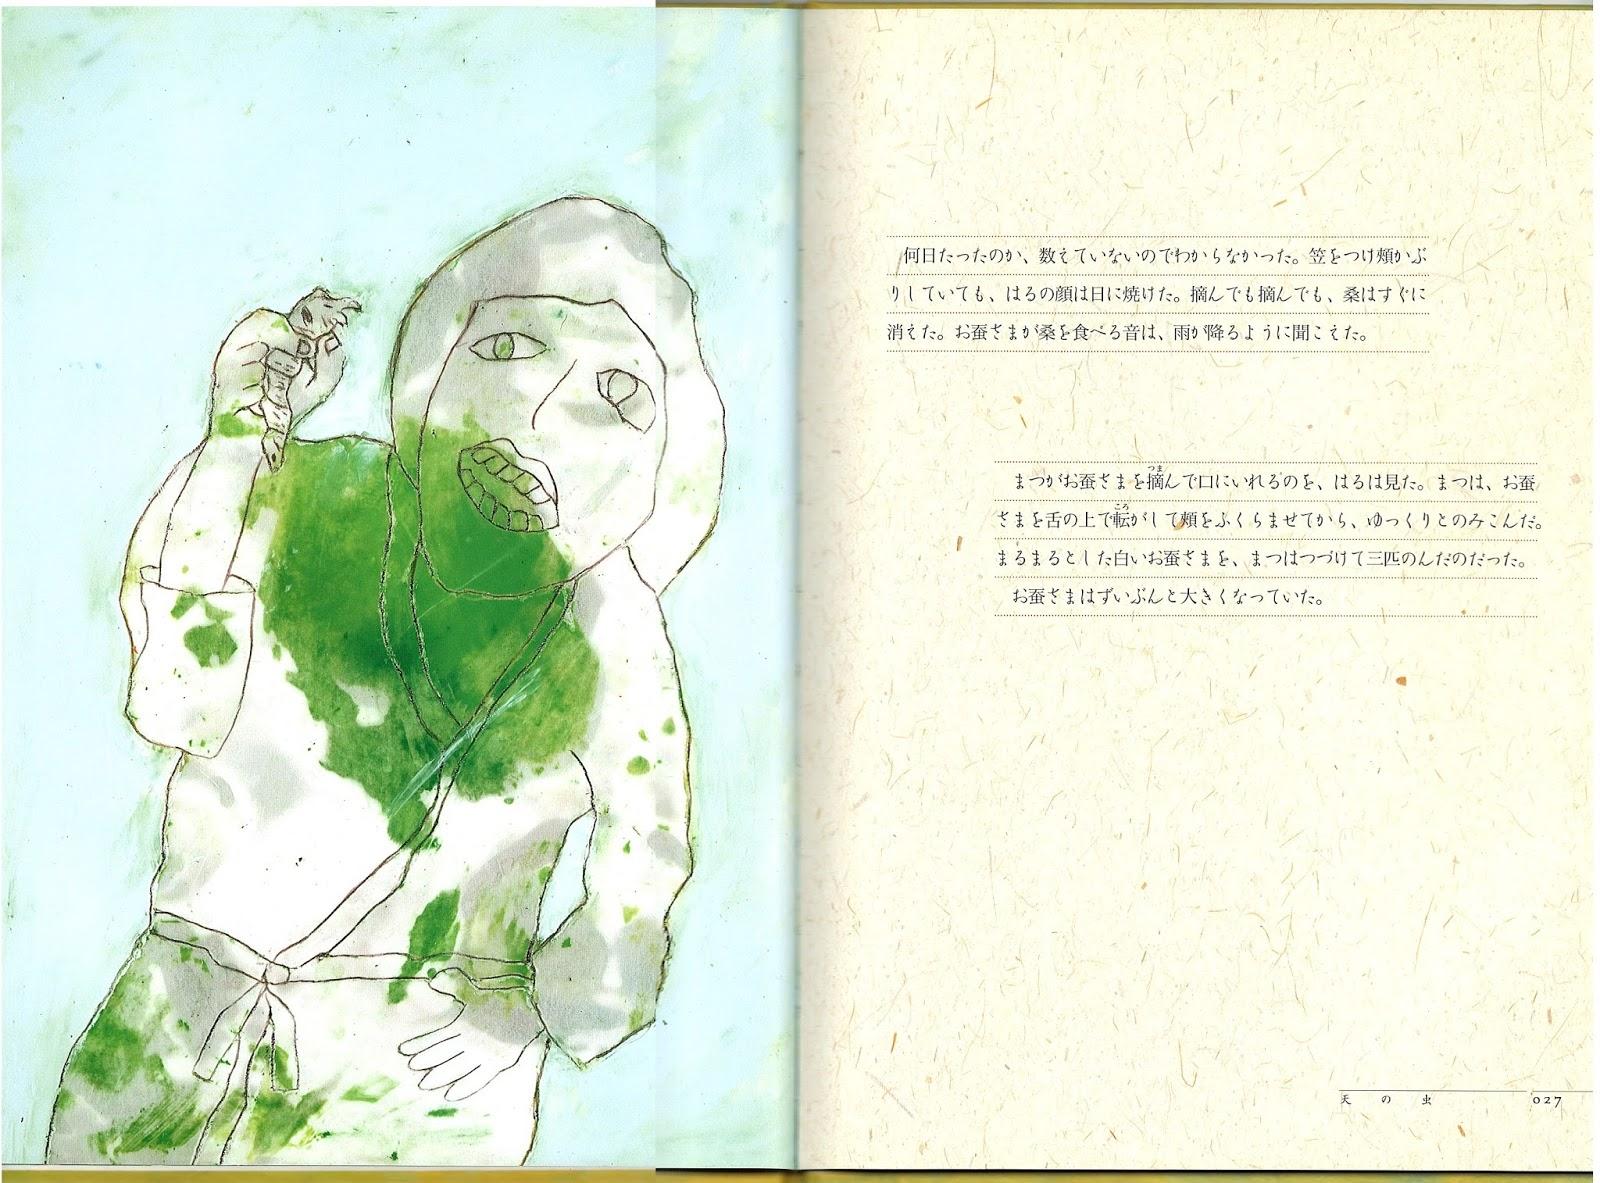 Tomokawa Kazuki* 友川かずき - エリセの目 [Erise No Me]